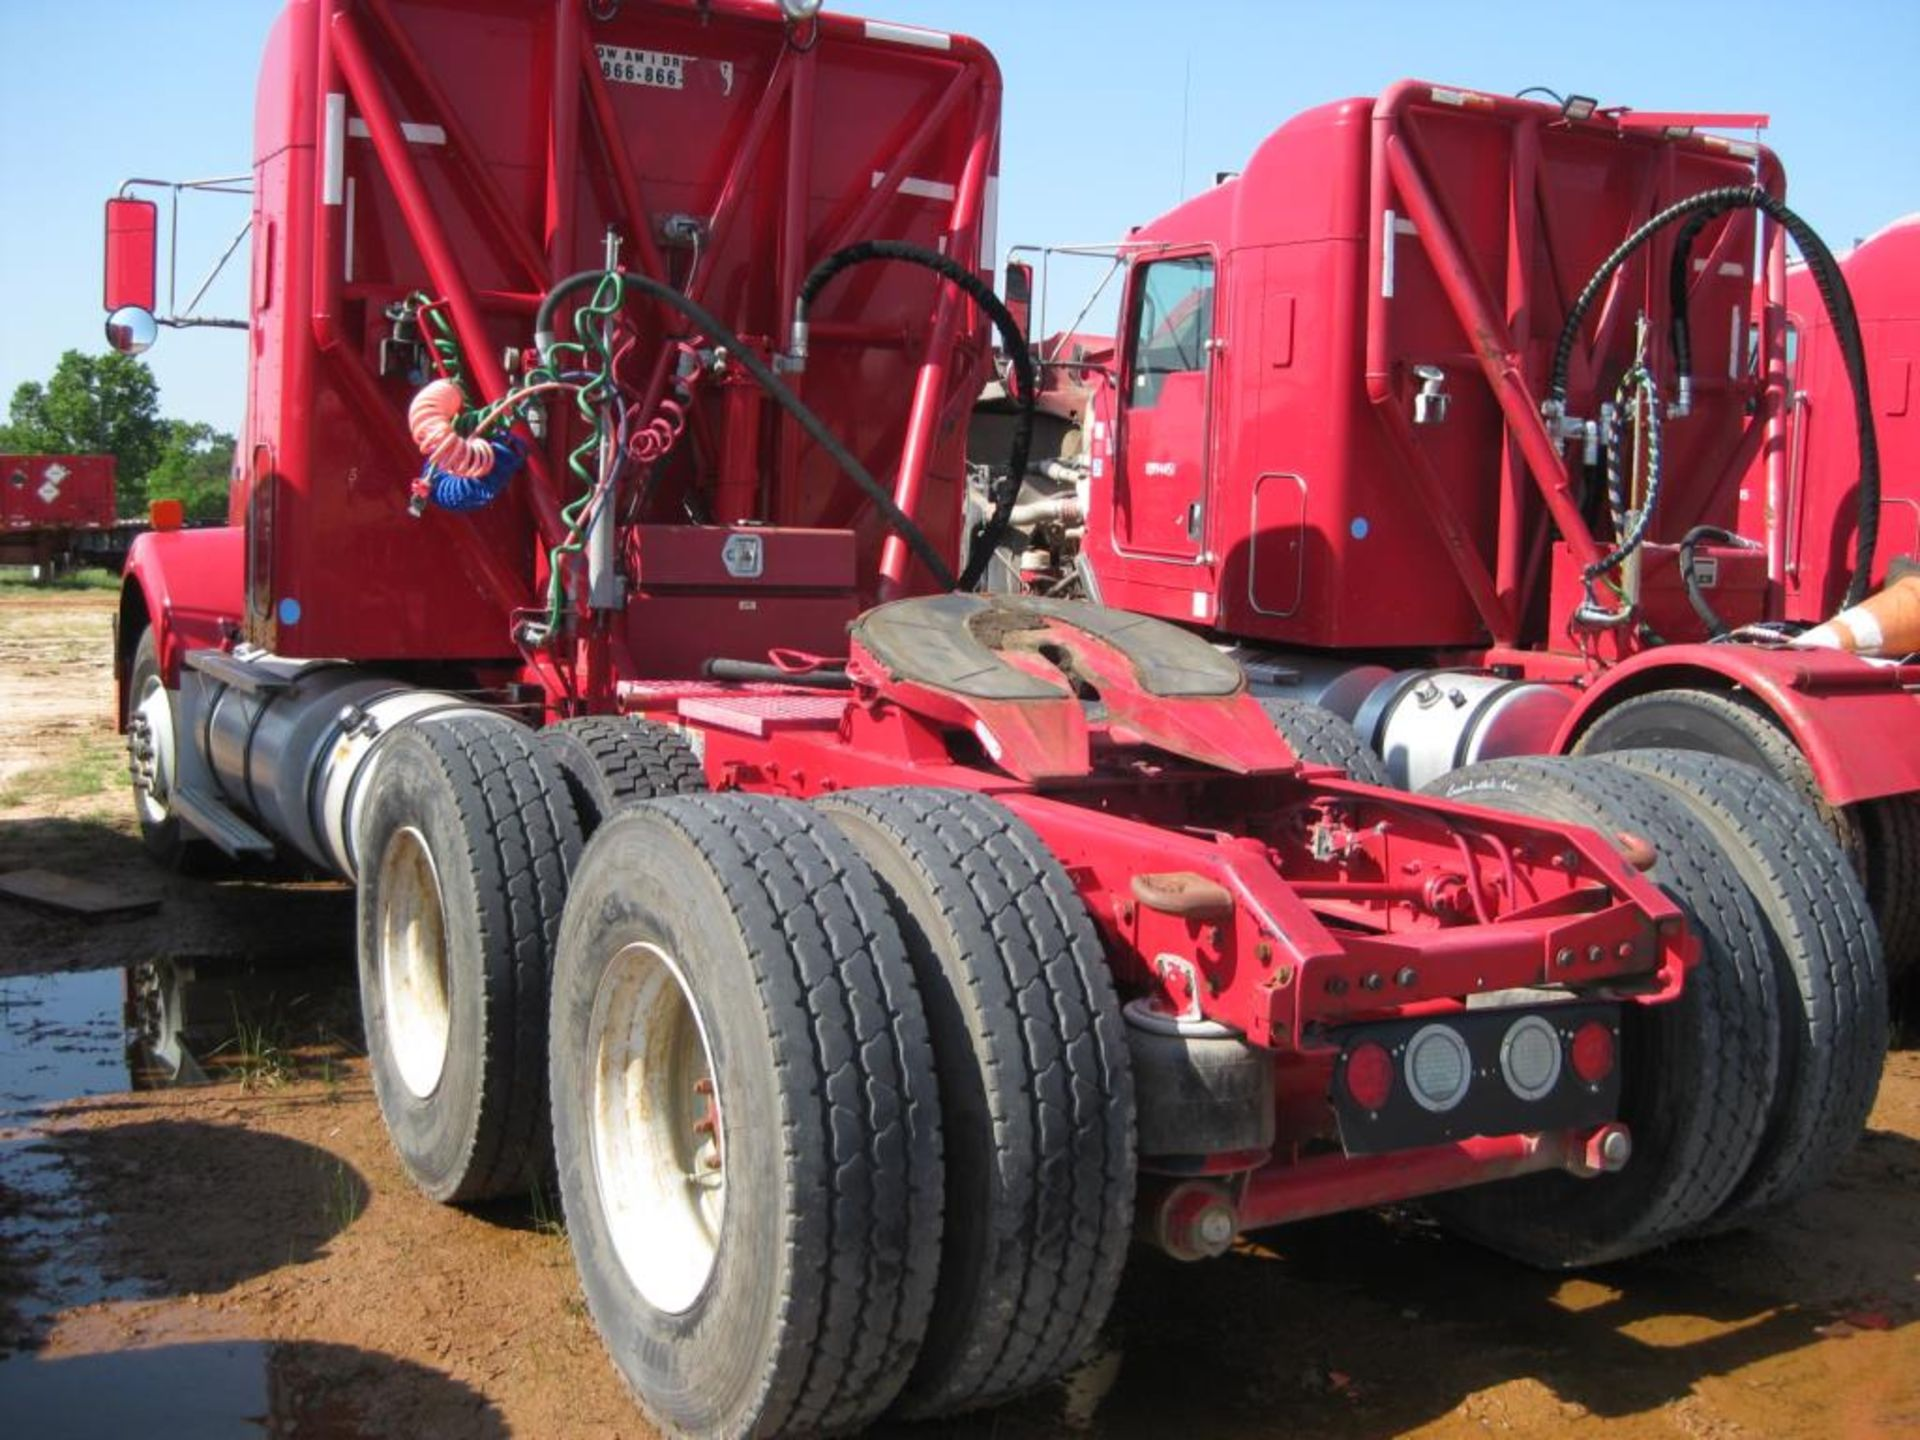 Kenworth Truck - Image 6 of 22